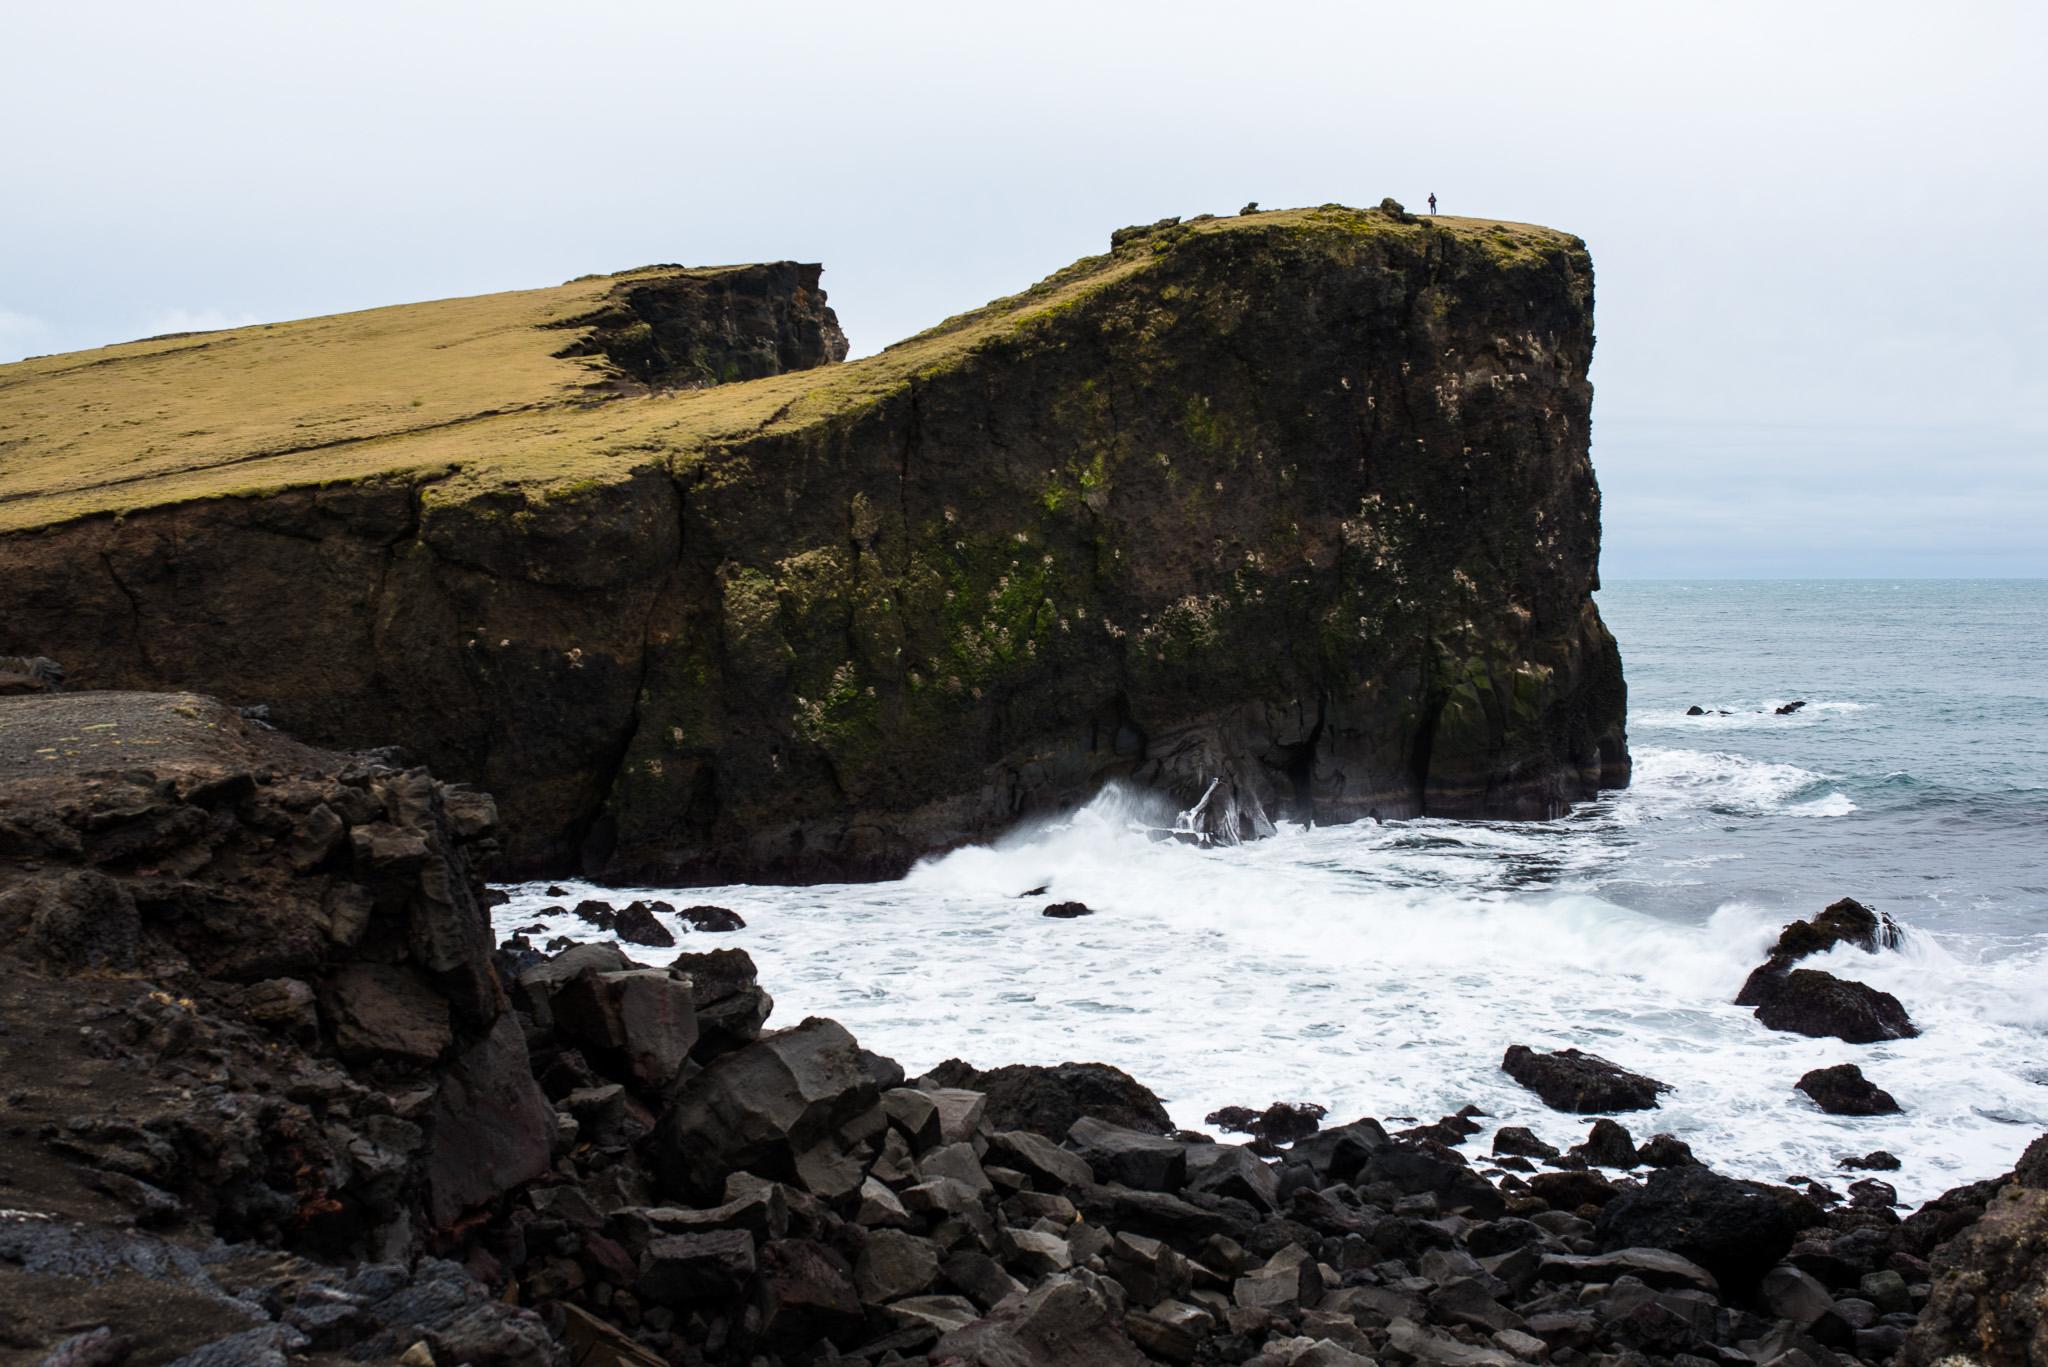 Tiny man, big cliffs.